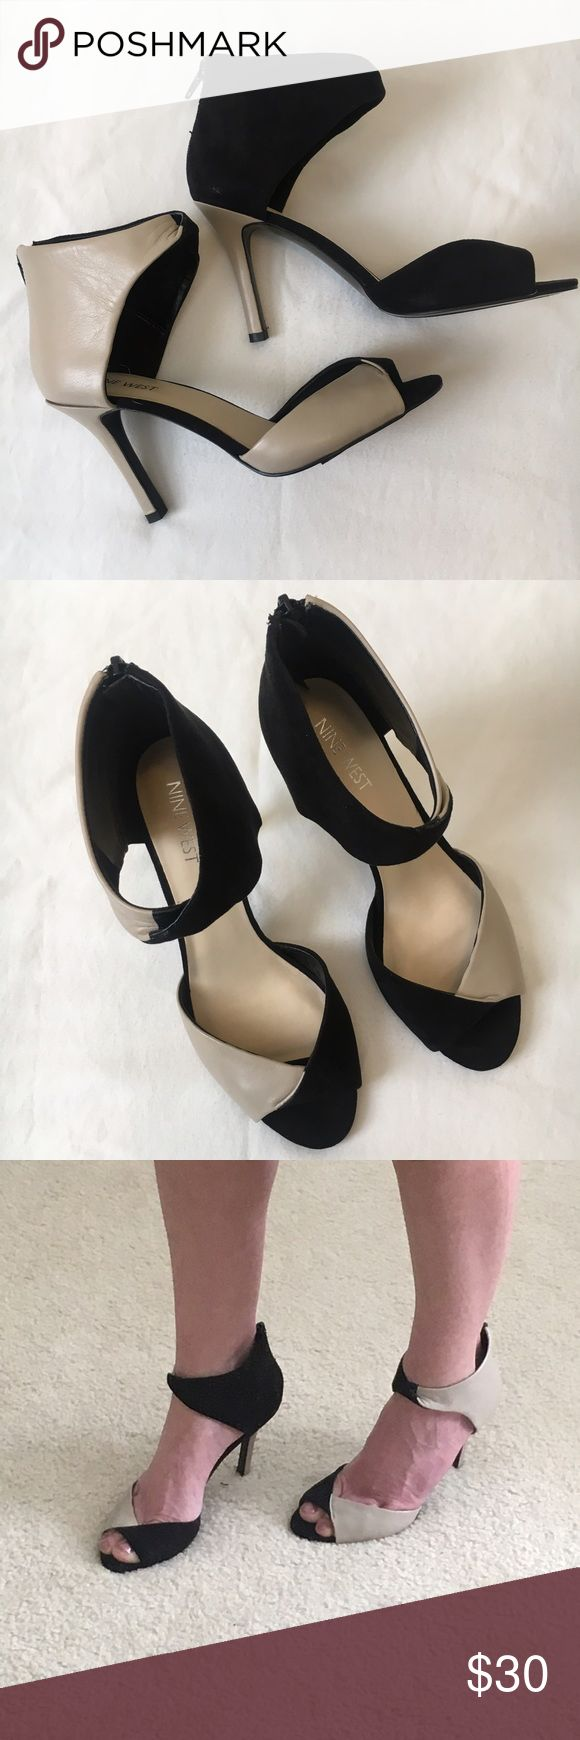 Nine West Two-toned Heels Nine West Two-toned Heels. Peep toe, Textile/Leather upper. Never worn. NIB Nine West Shoes Heels